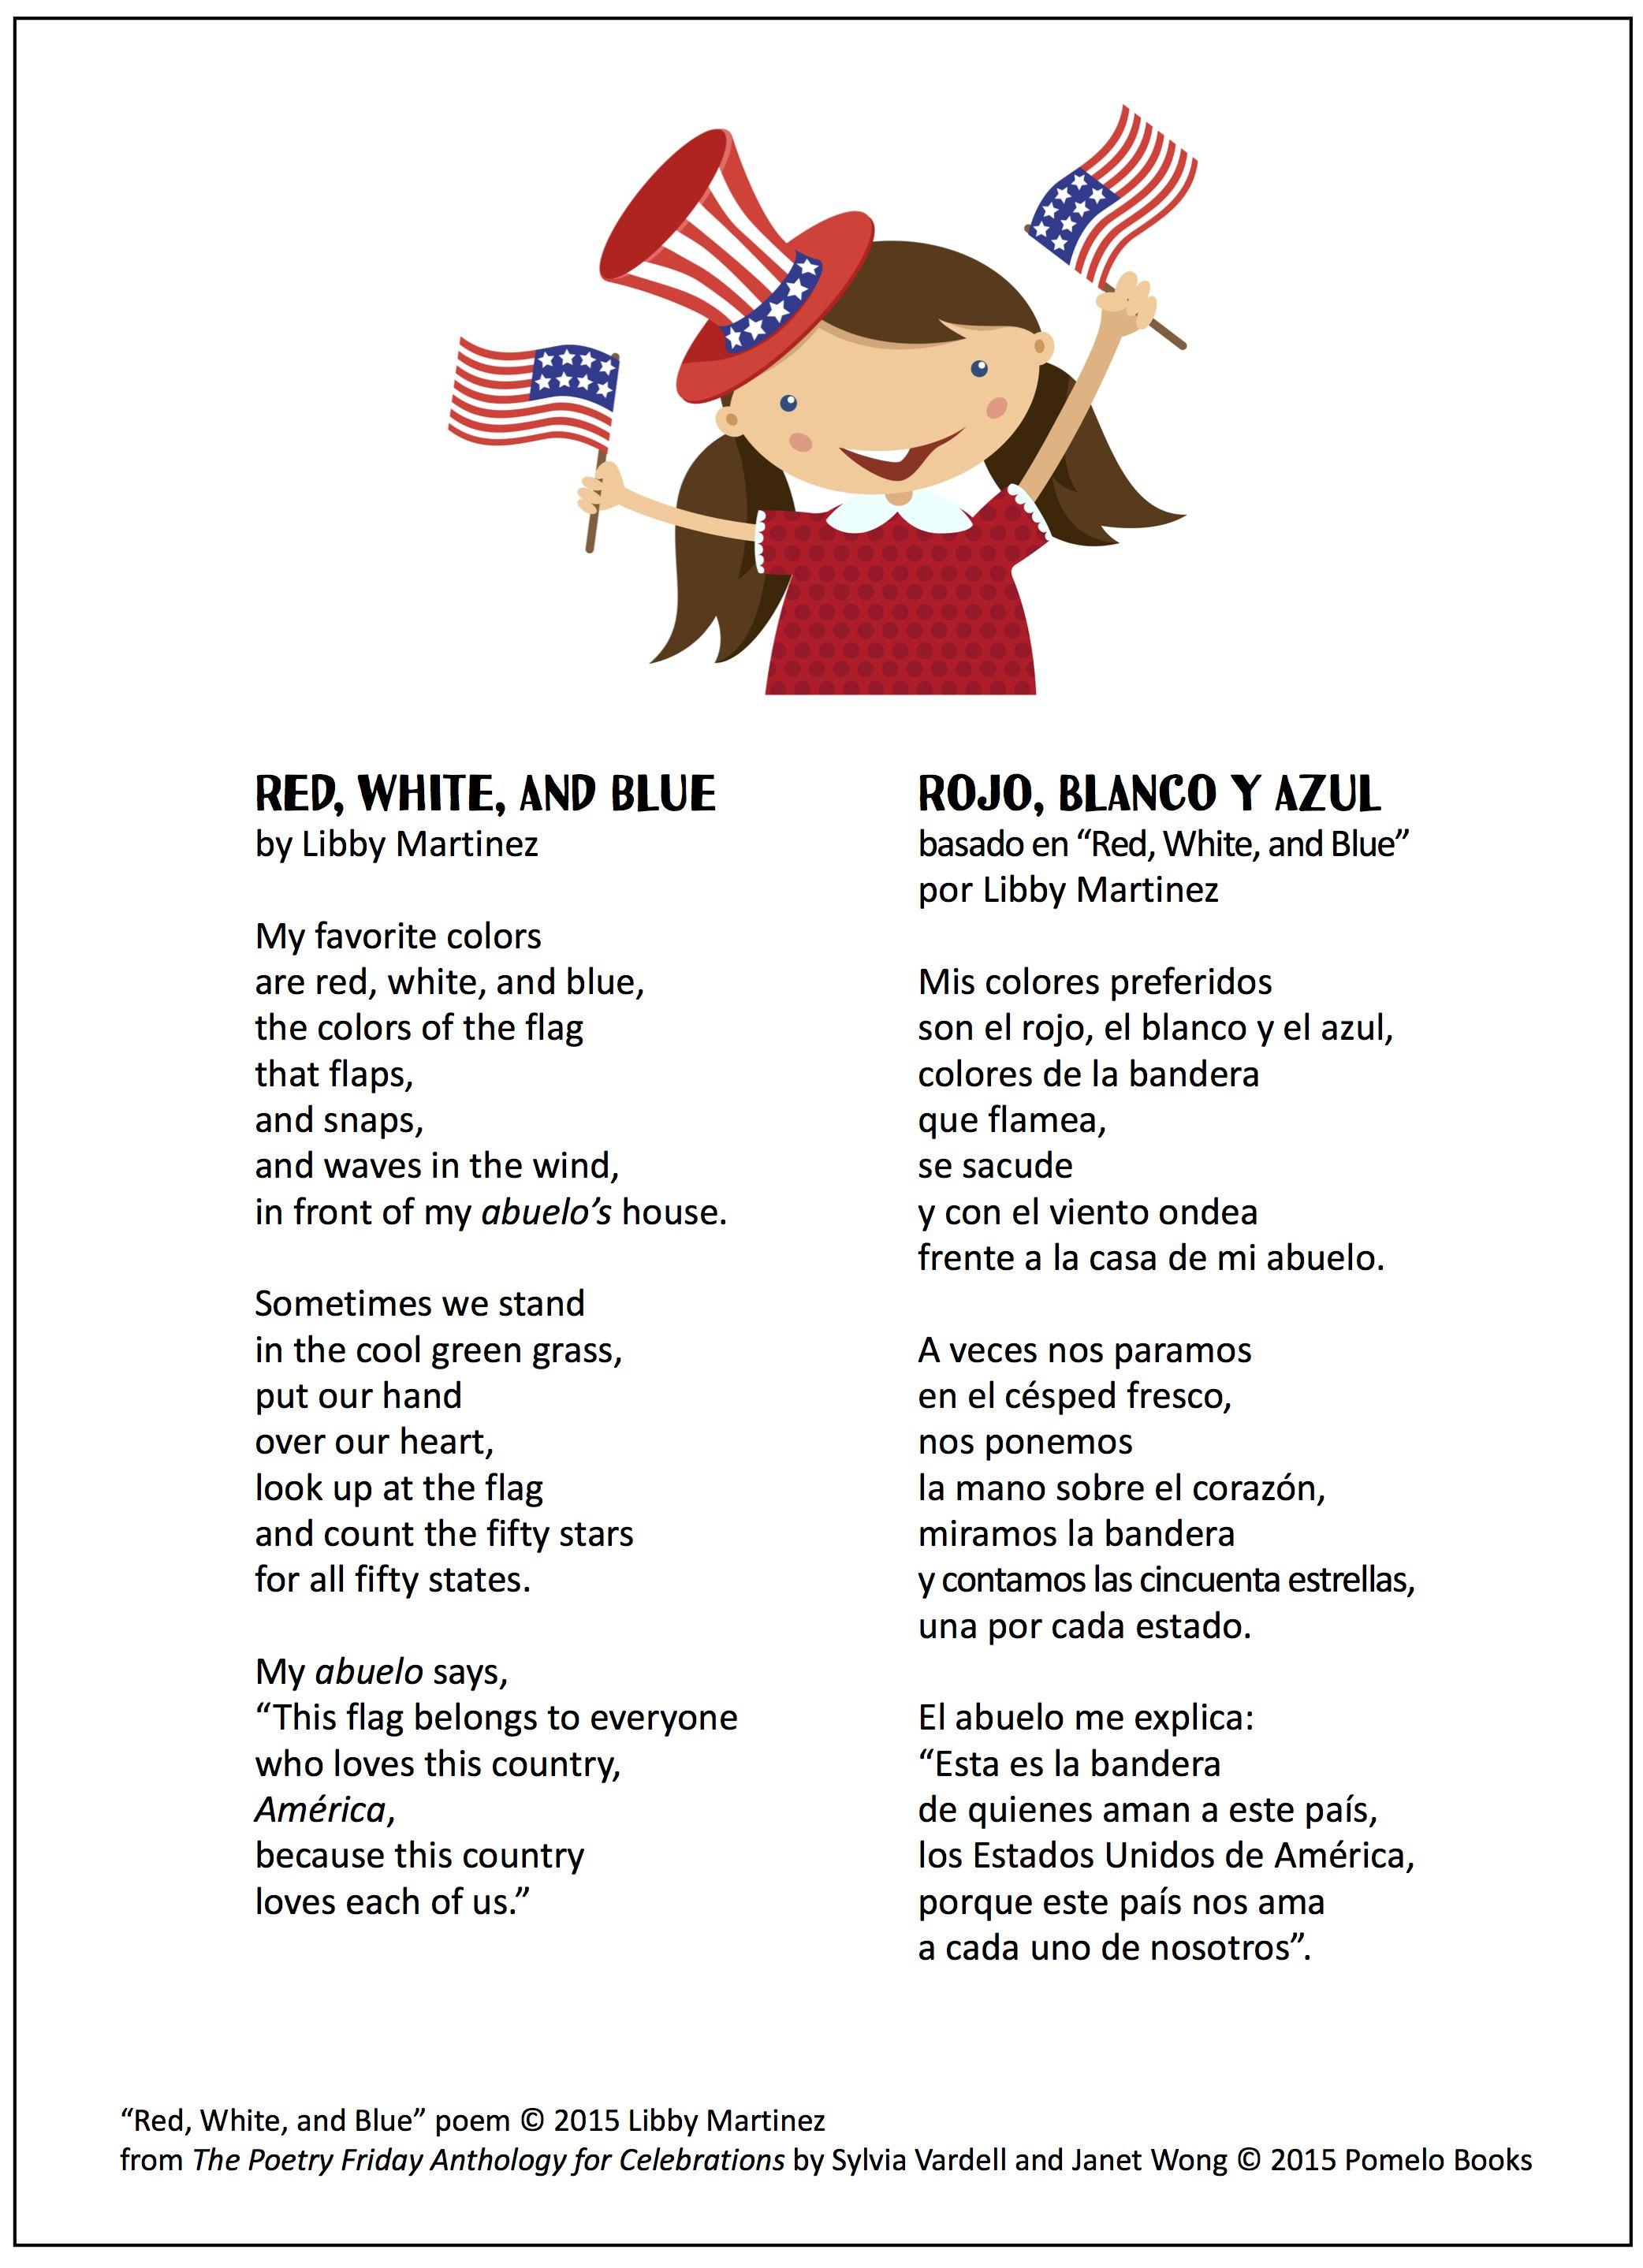 Pin On Bilingual Poems In Spanish And English Poemas En Espanol Y Ingles